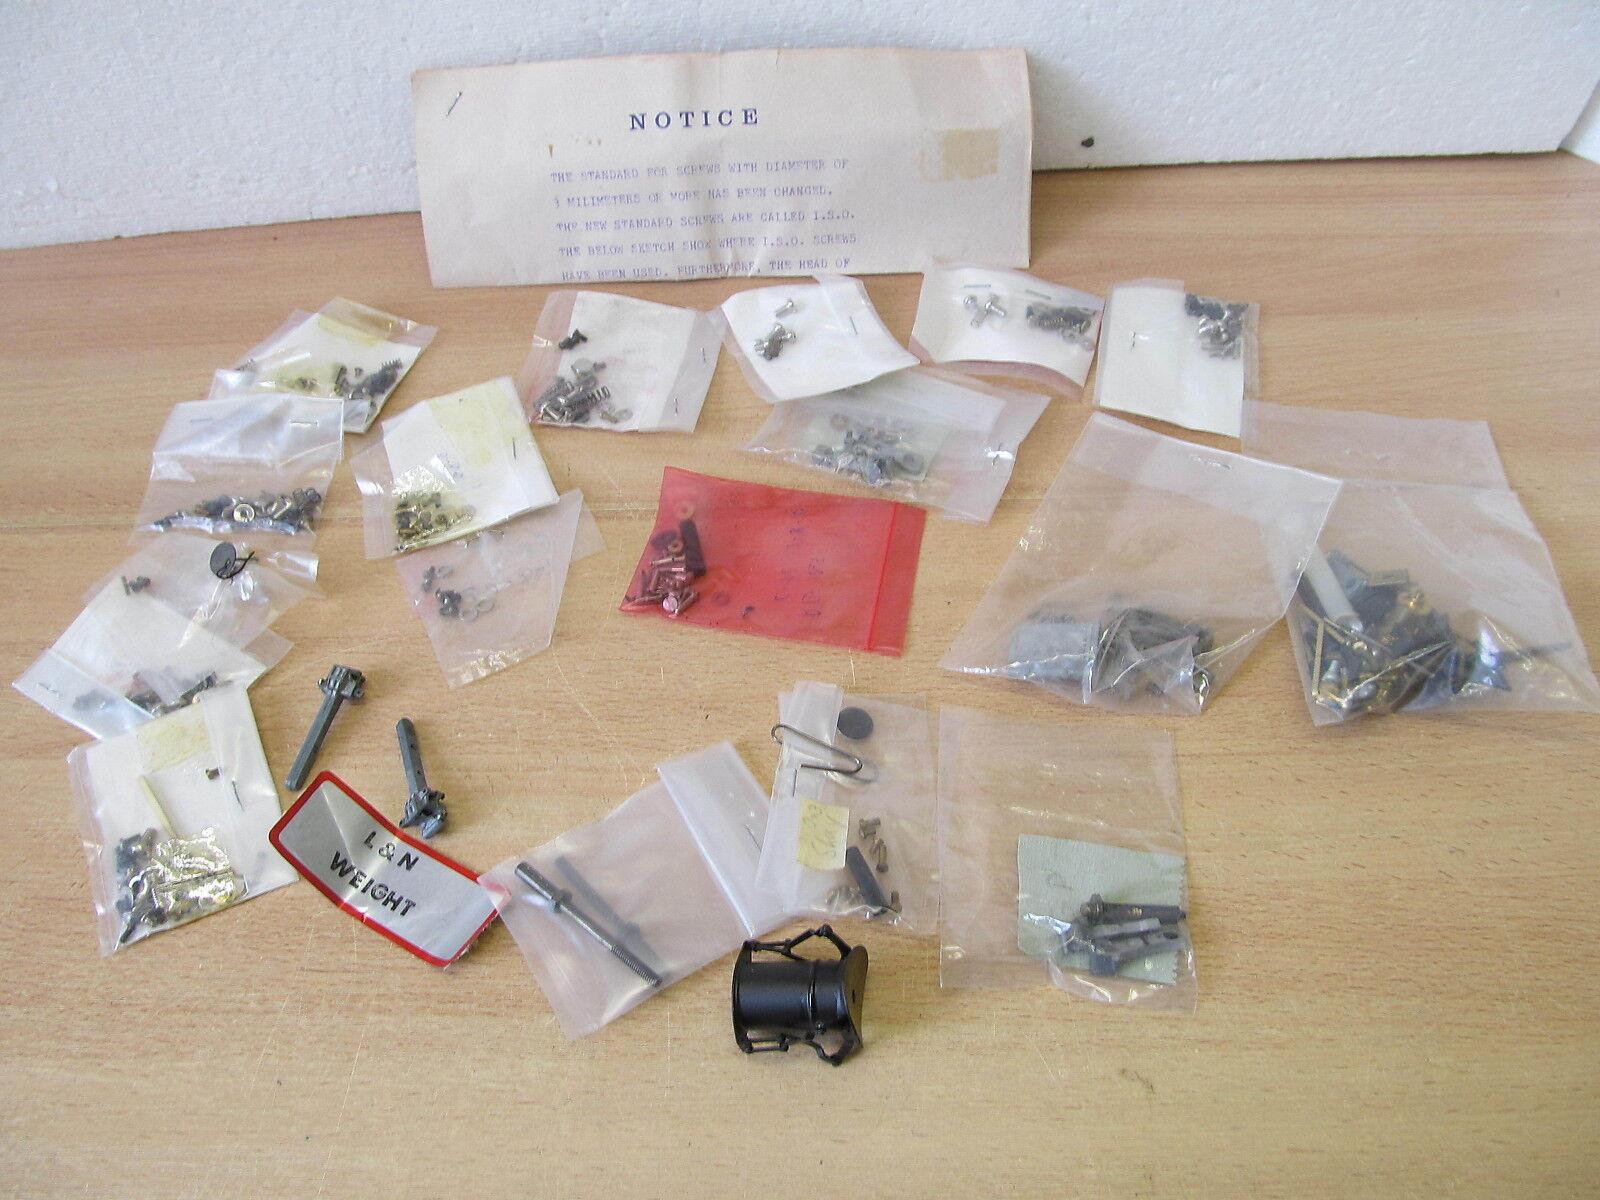 Mes-34534 sp0 useful accessories zurüstteile for US wagons, locomotives, Metal